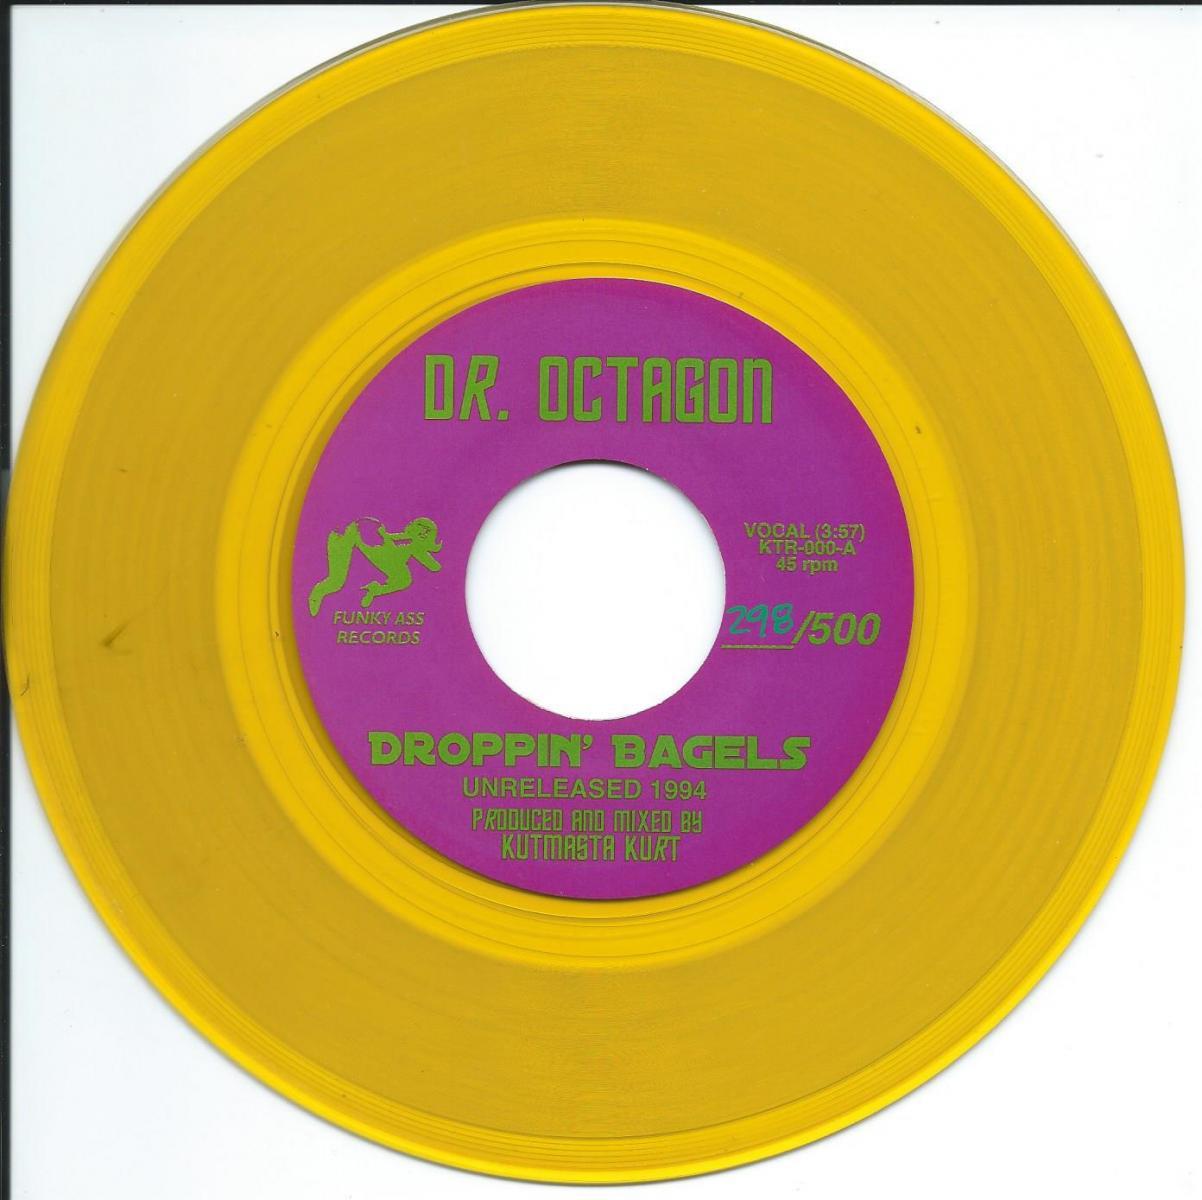 DR. OCTAGON / DROPPIN' BAGELS (7